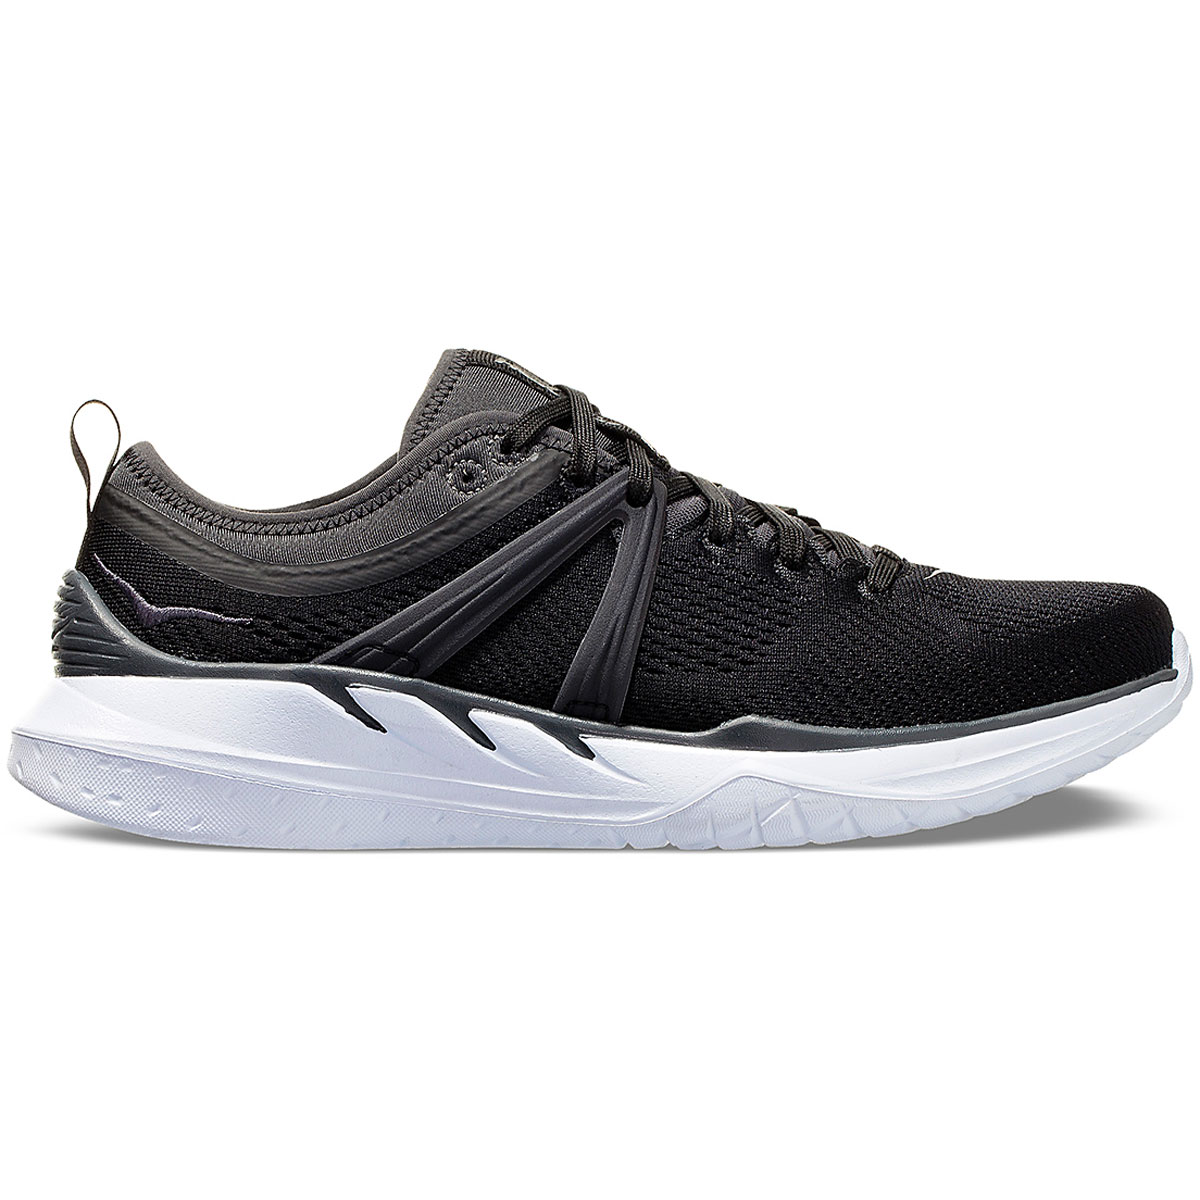 Women's Hoka One One Tivra Running Shoe - Color: Black/Dark Shadow - Size: 5 - Width: Regular, Black/Dark Shadow, large, image 1